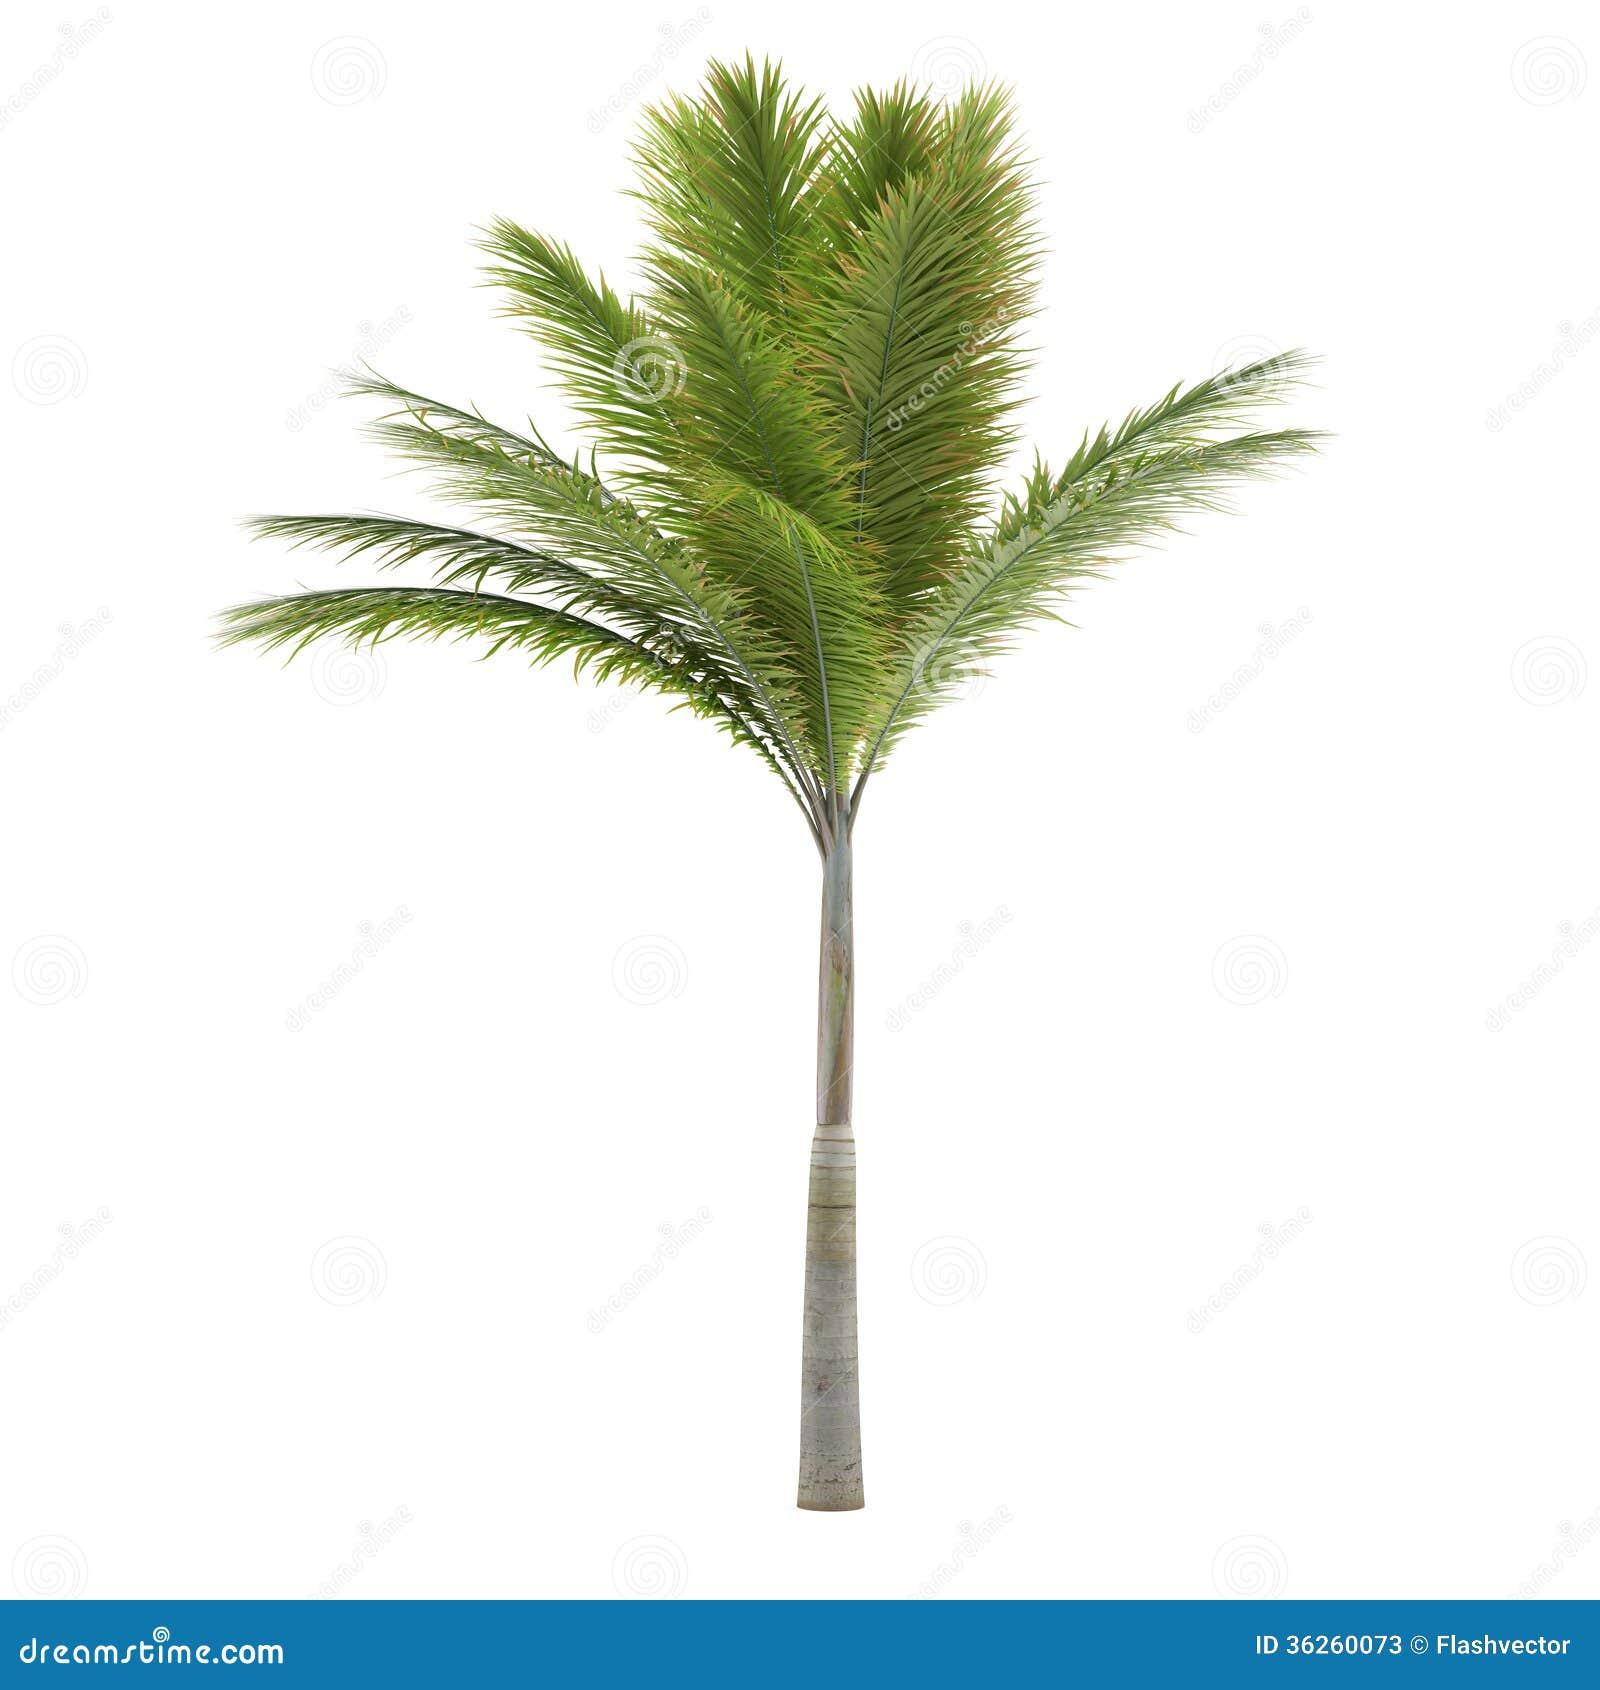 Palmeira isolada. Archontophoenix